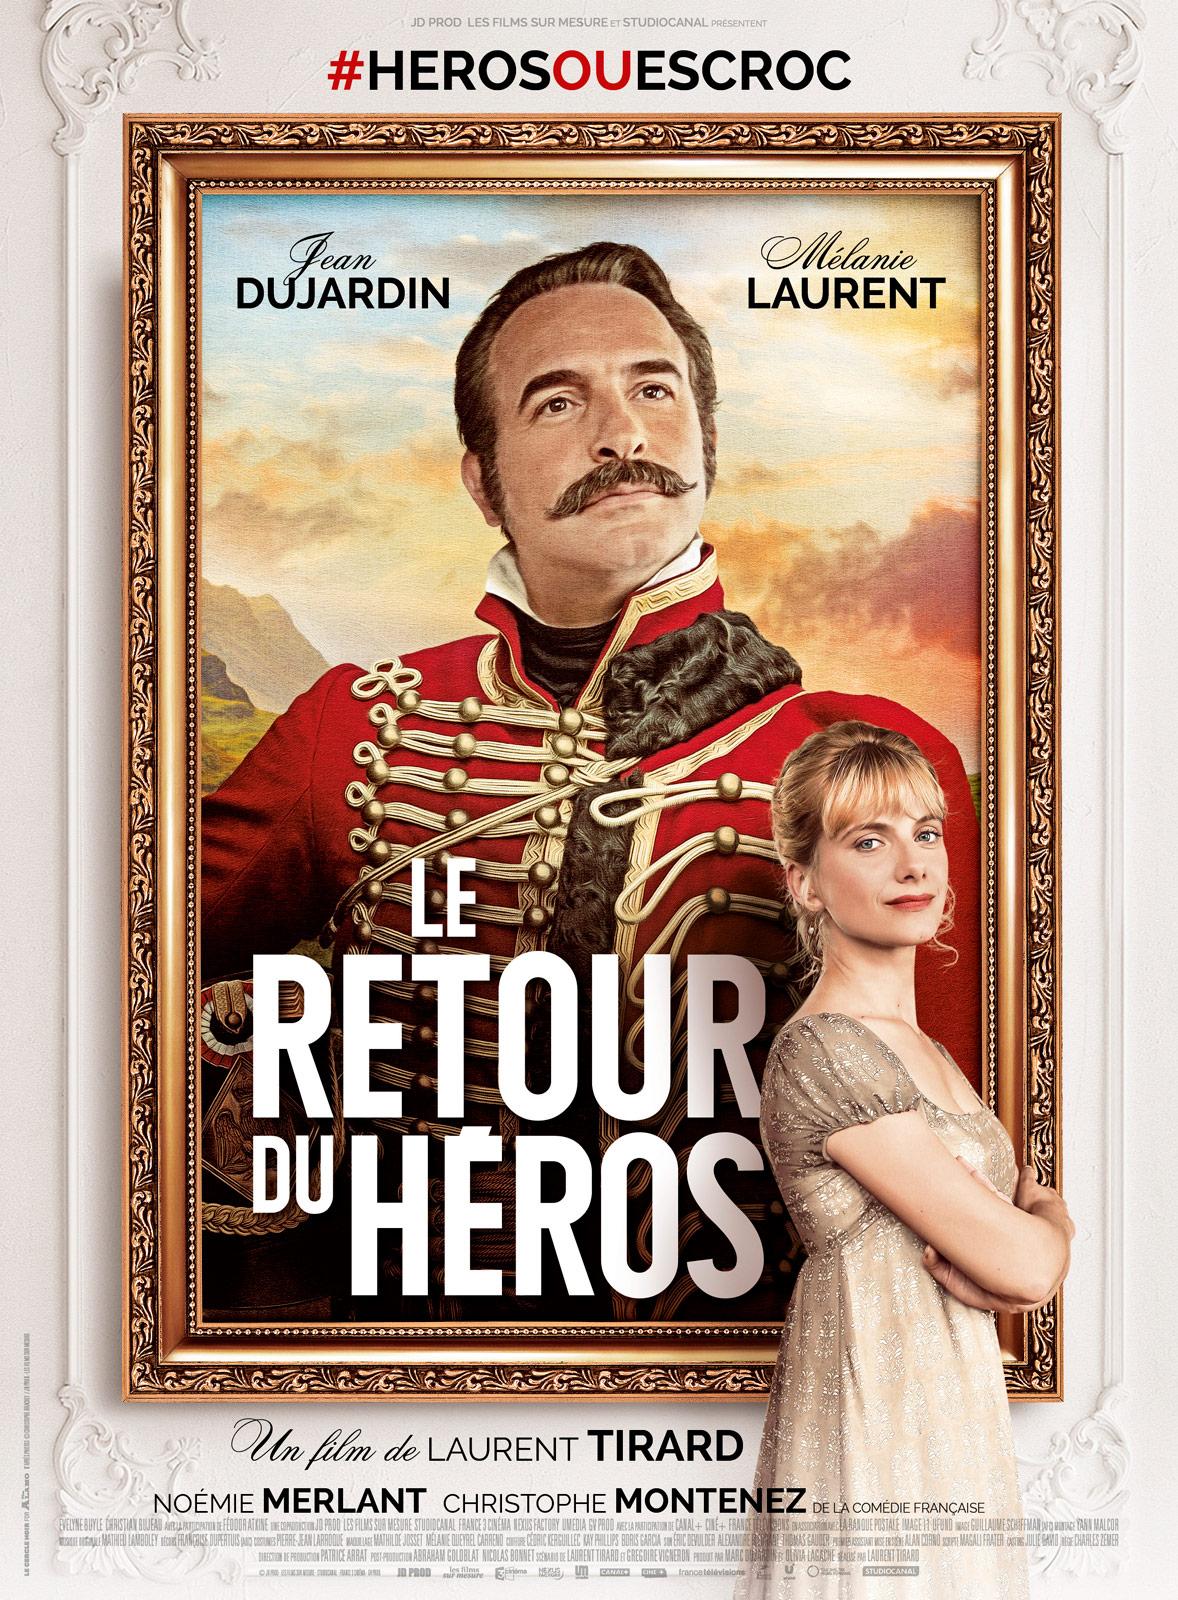 http://rss.allocine.fr/~r/ac/cine/cettesemaine/~3/o3cGPAY0jmw/fichefilm_gen_cfilm=256184.html